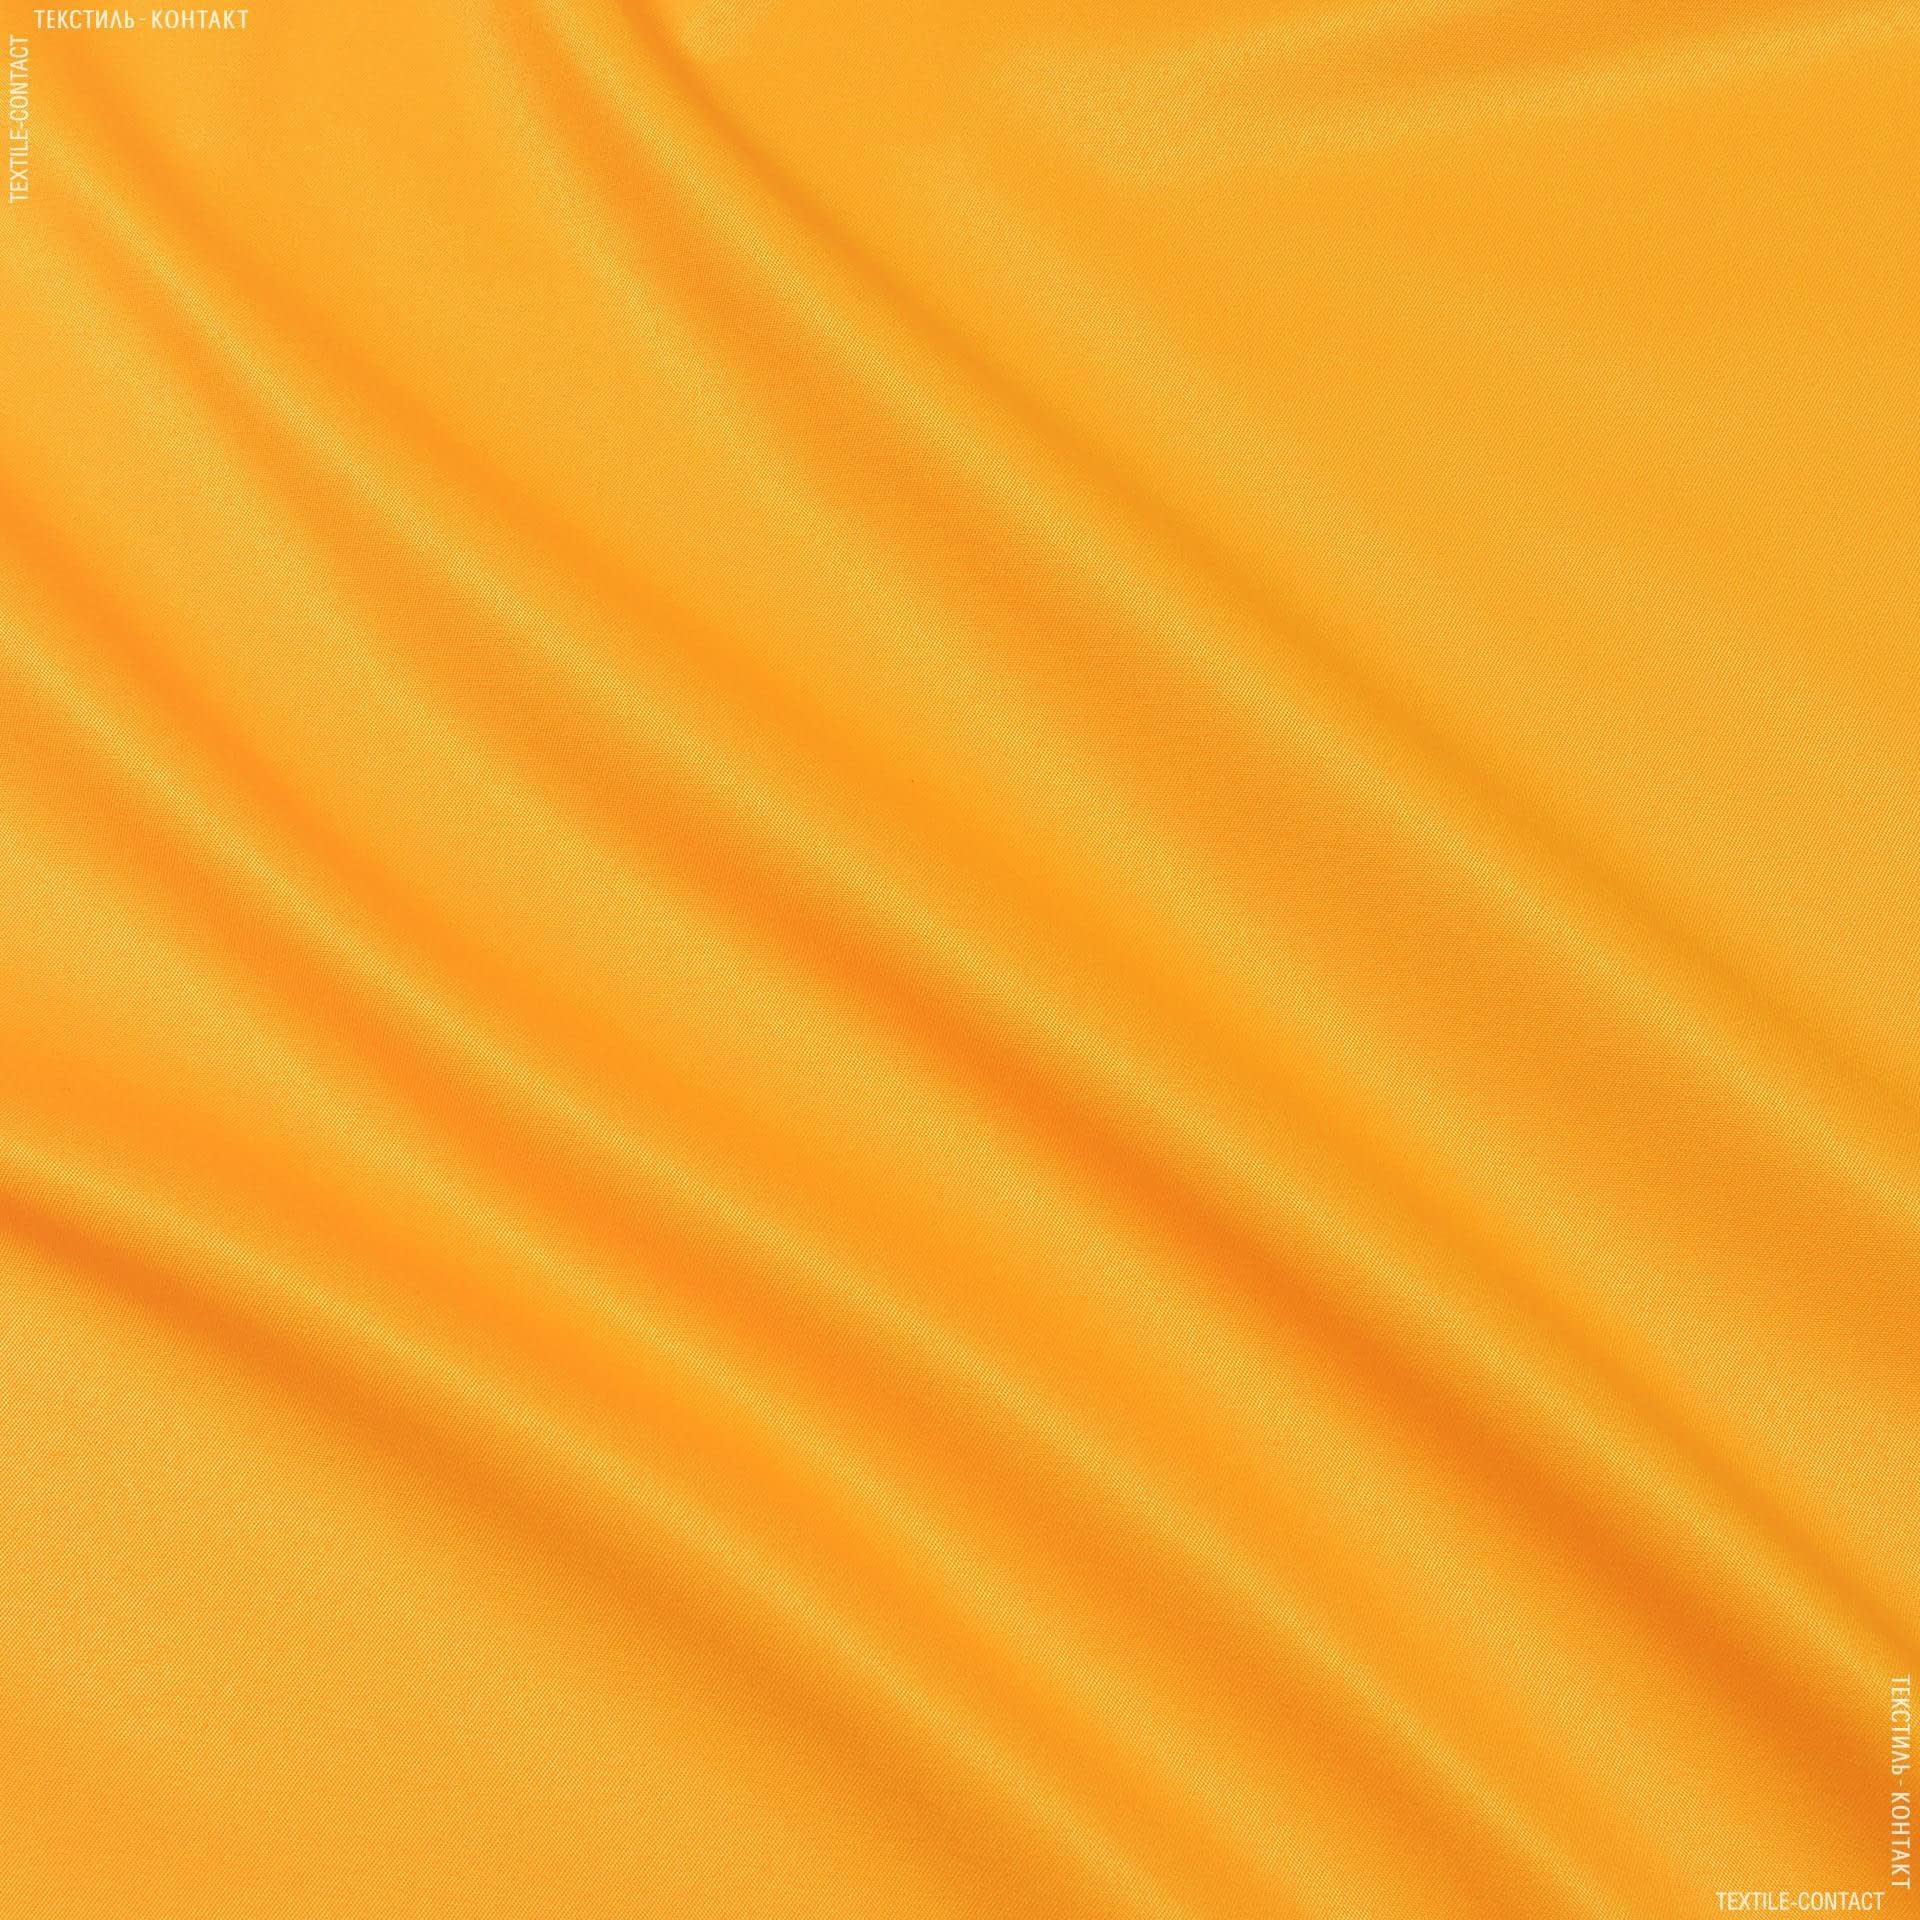 Ткани для спецодежды - Грета-2701 темно-желтый